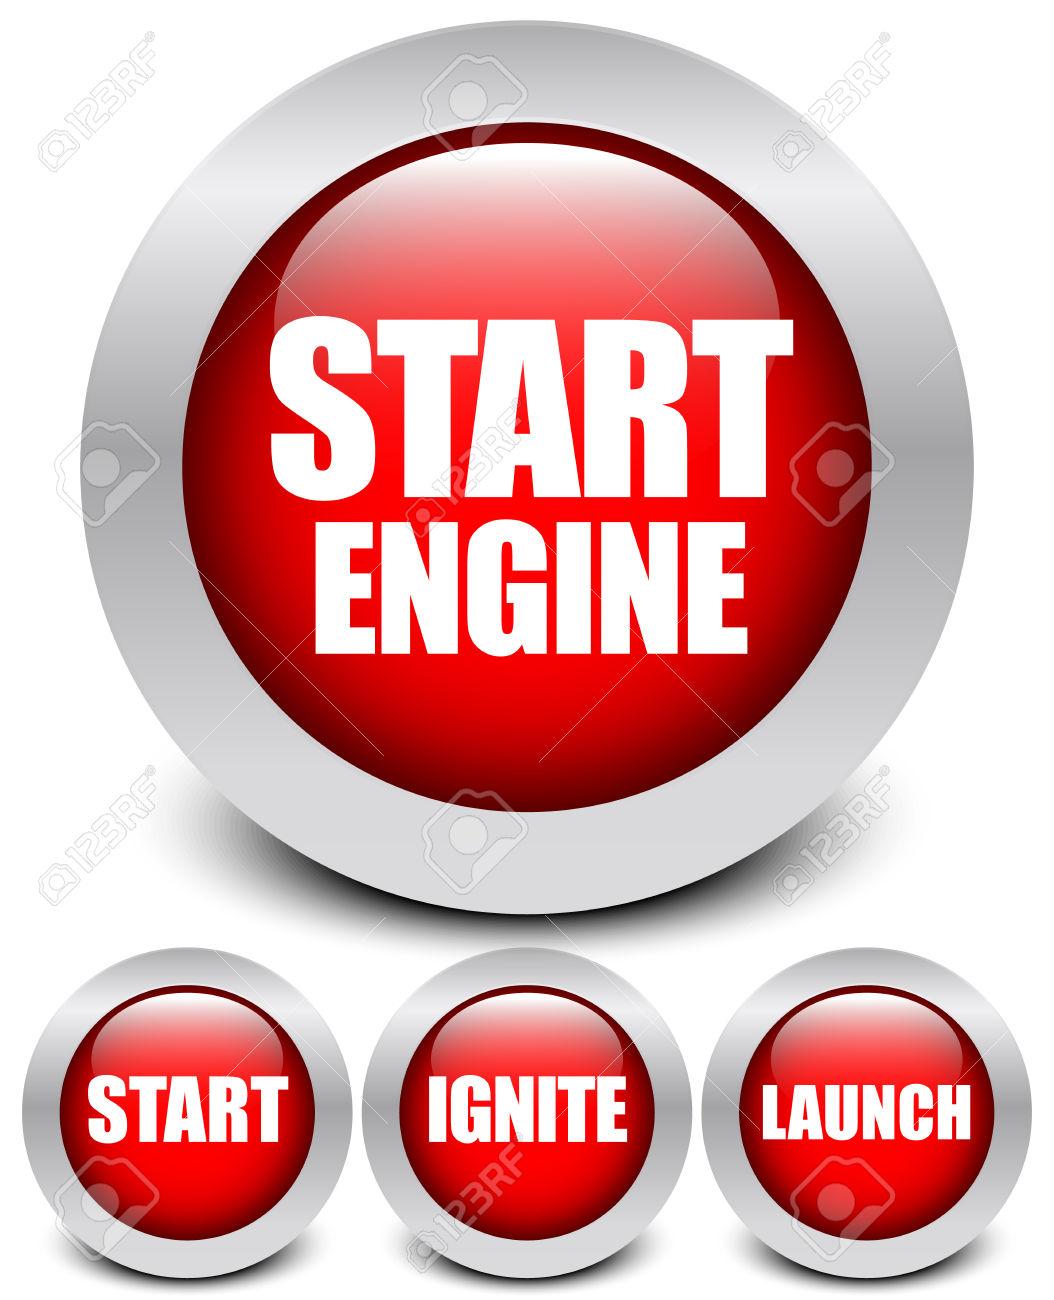 Button Set: Start Engine, Start, Ignite, Launch. Royalty Free.